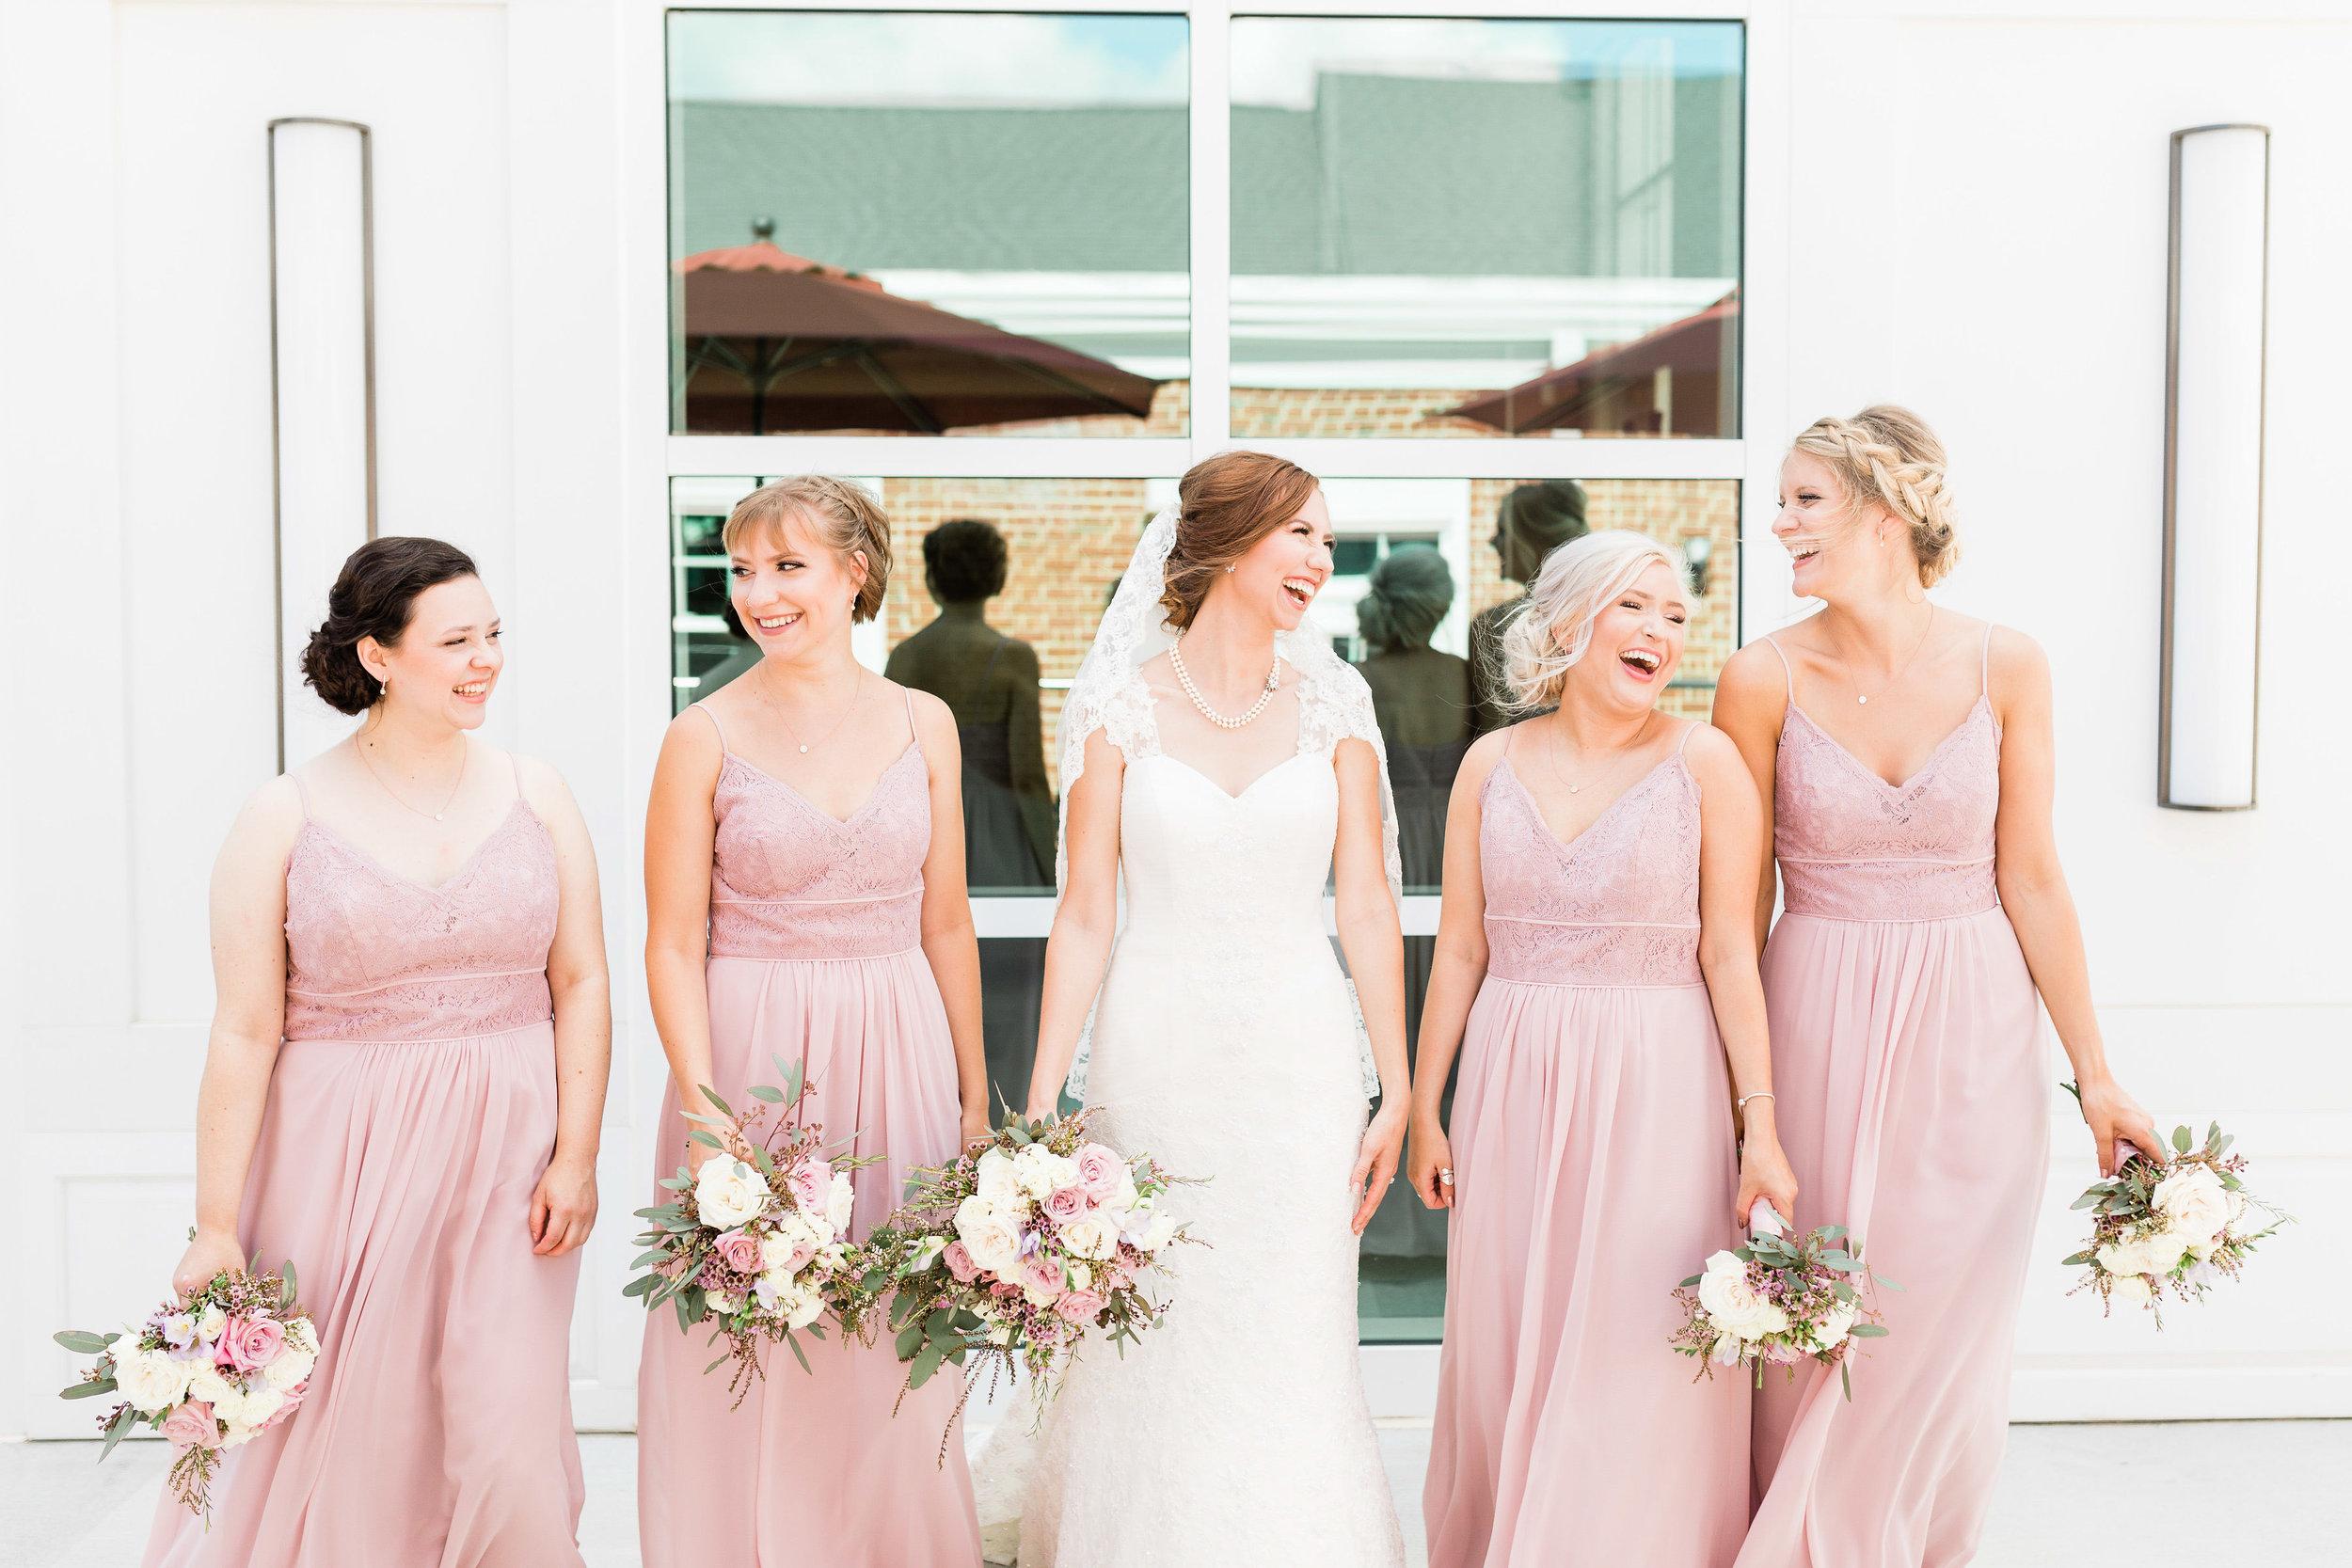 lauren day photography cincinnati wedding photographer bridal party pictures-3.jpg